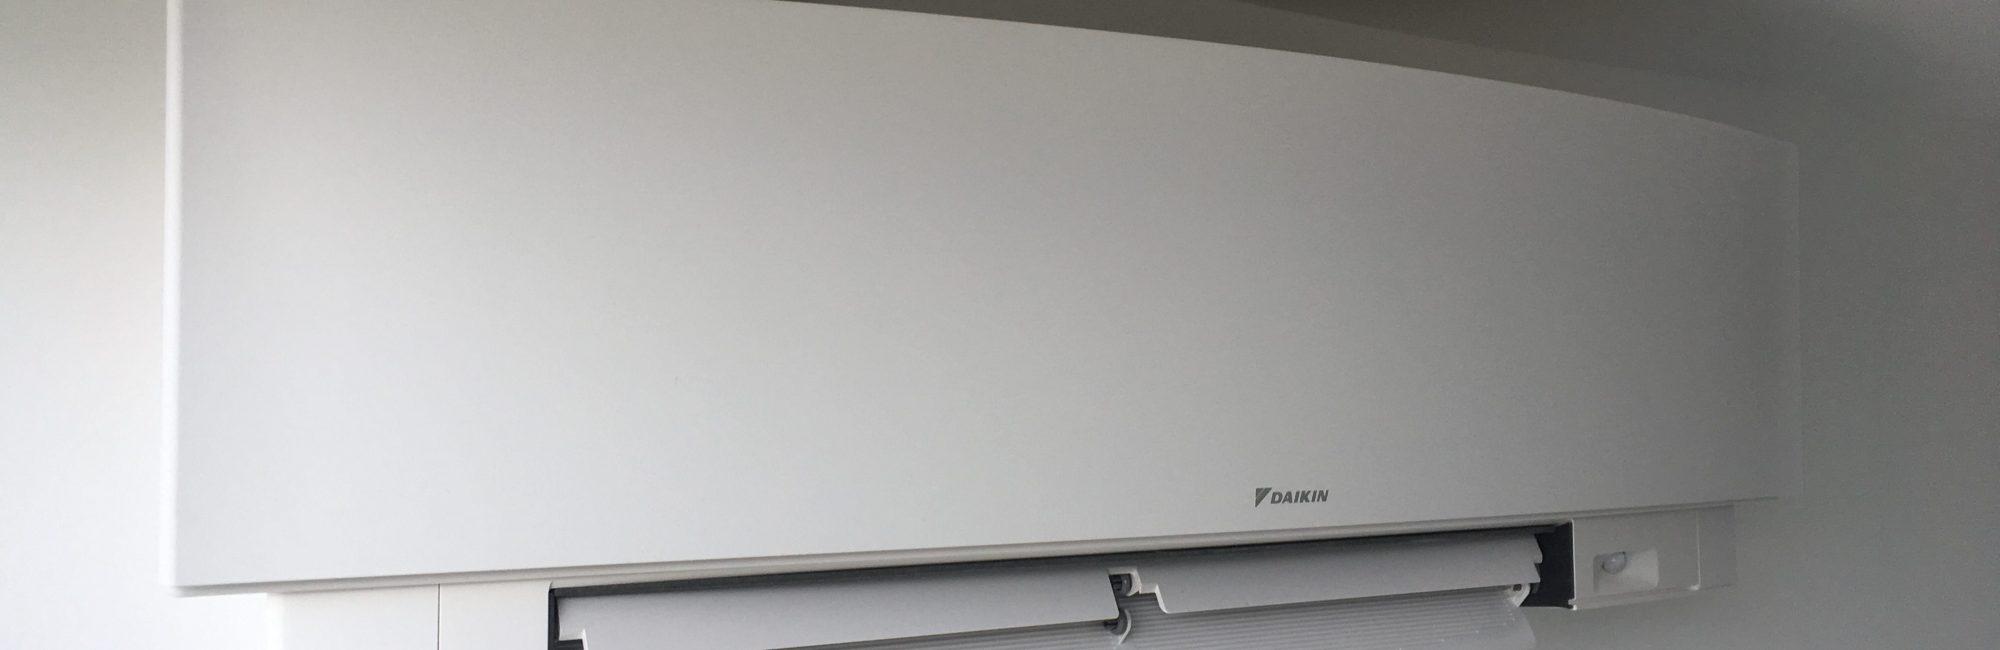 Daikin Emura Air Conditioning Installation in Cornwall